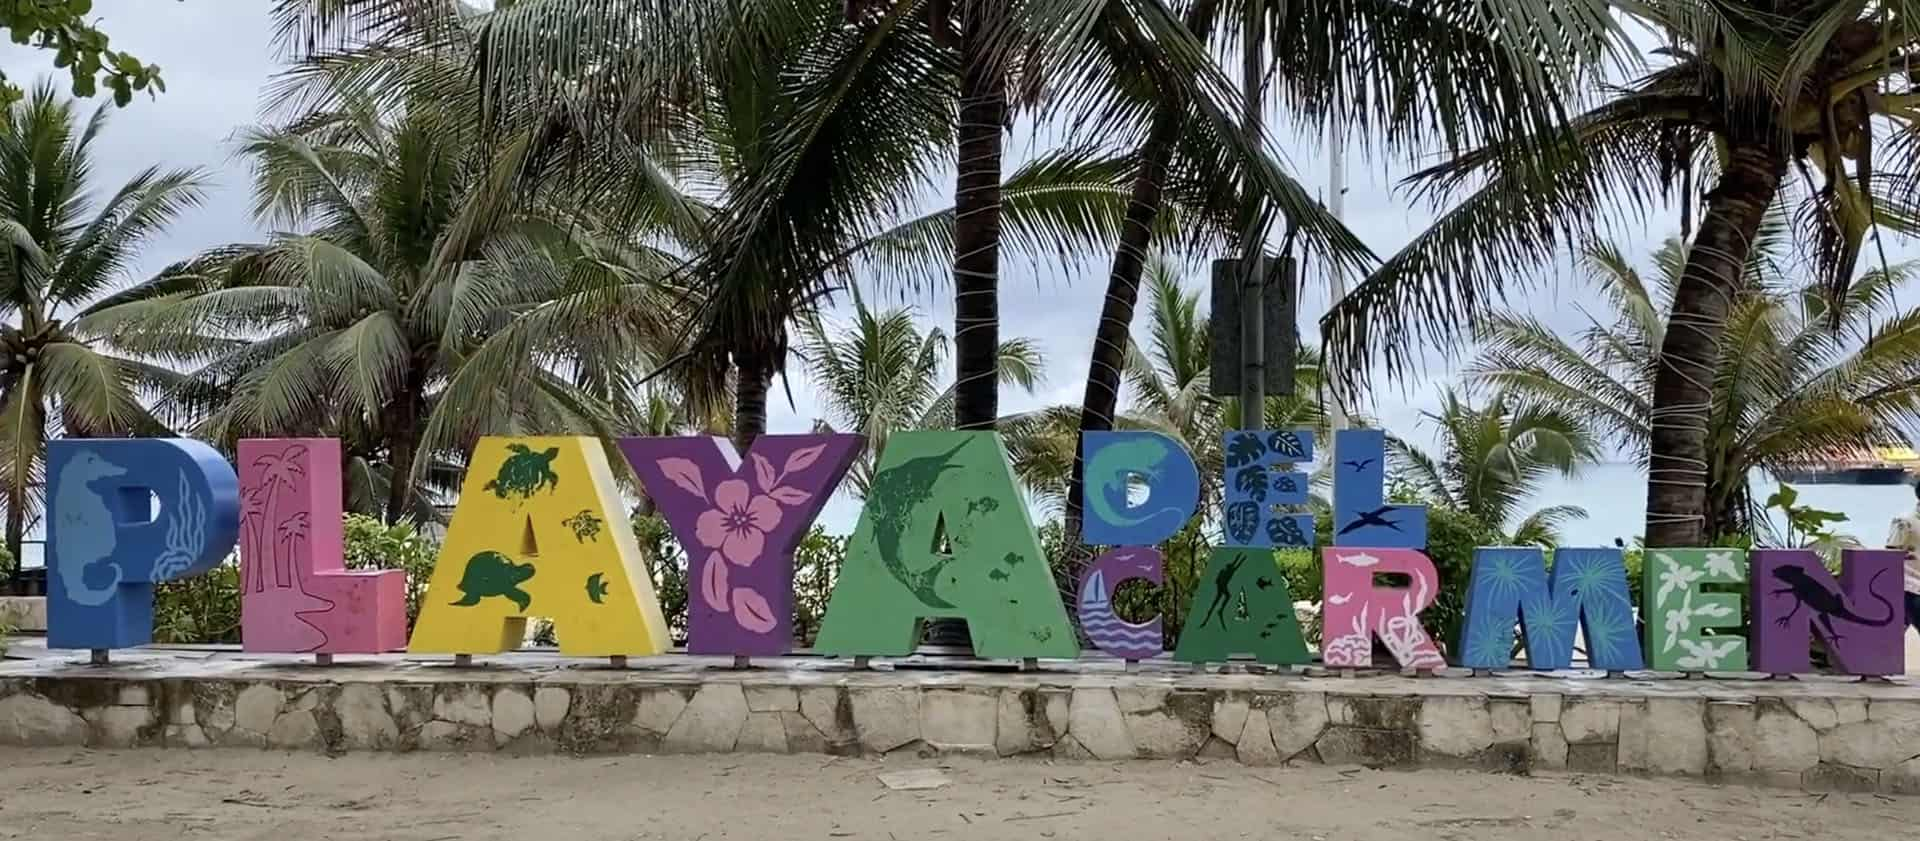 places to visit in yucatan playa del carmen sign